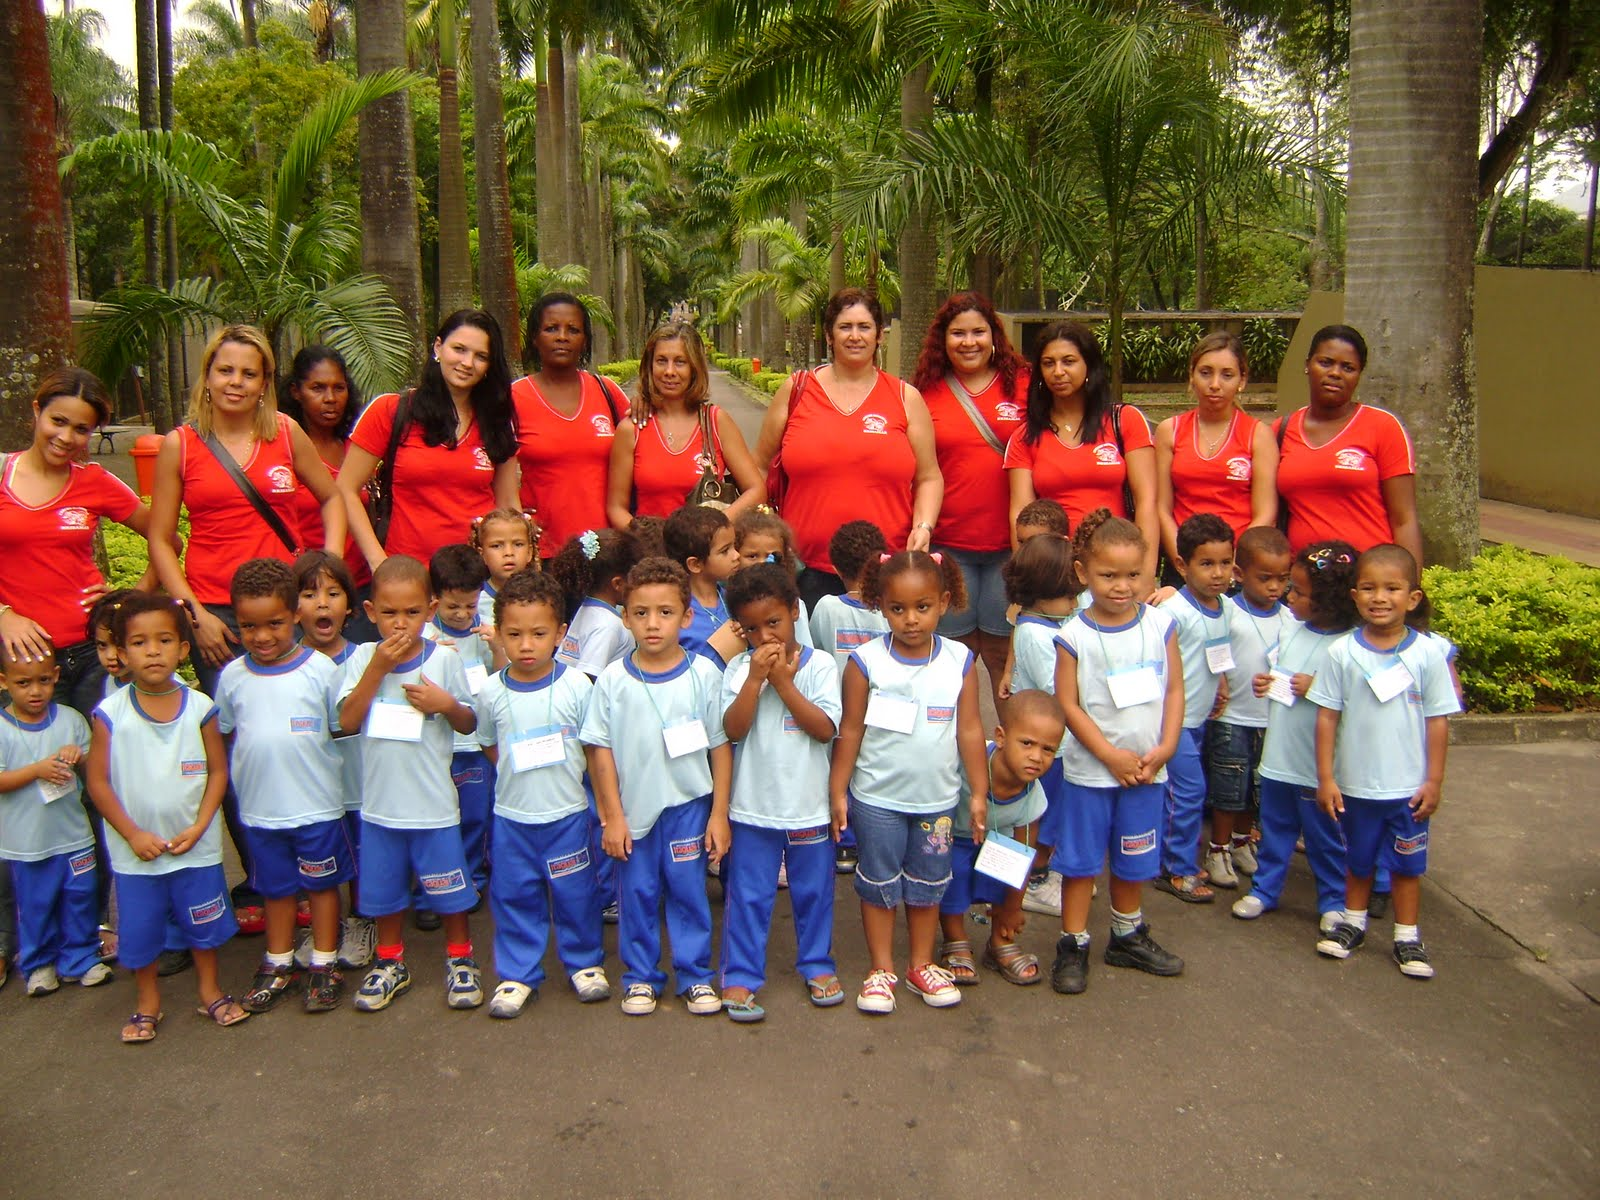 festa jardim zoologico: Municipal Brisamar – Passeio ao Jardim Zoológico e Festa da criança